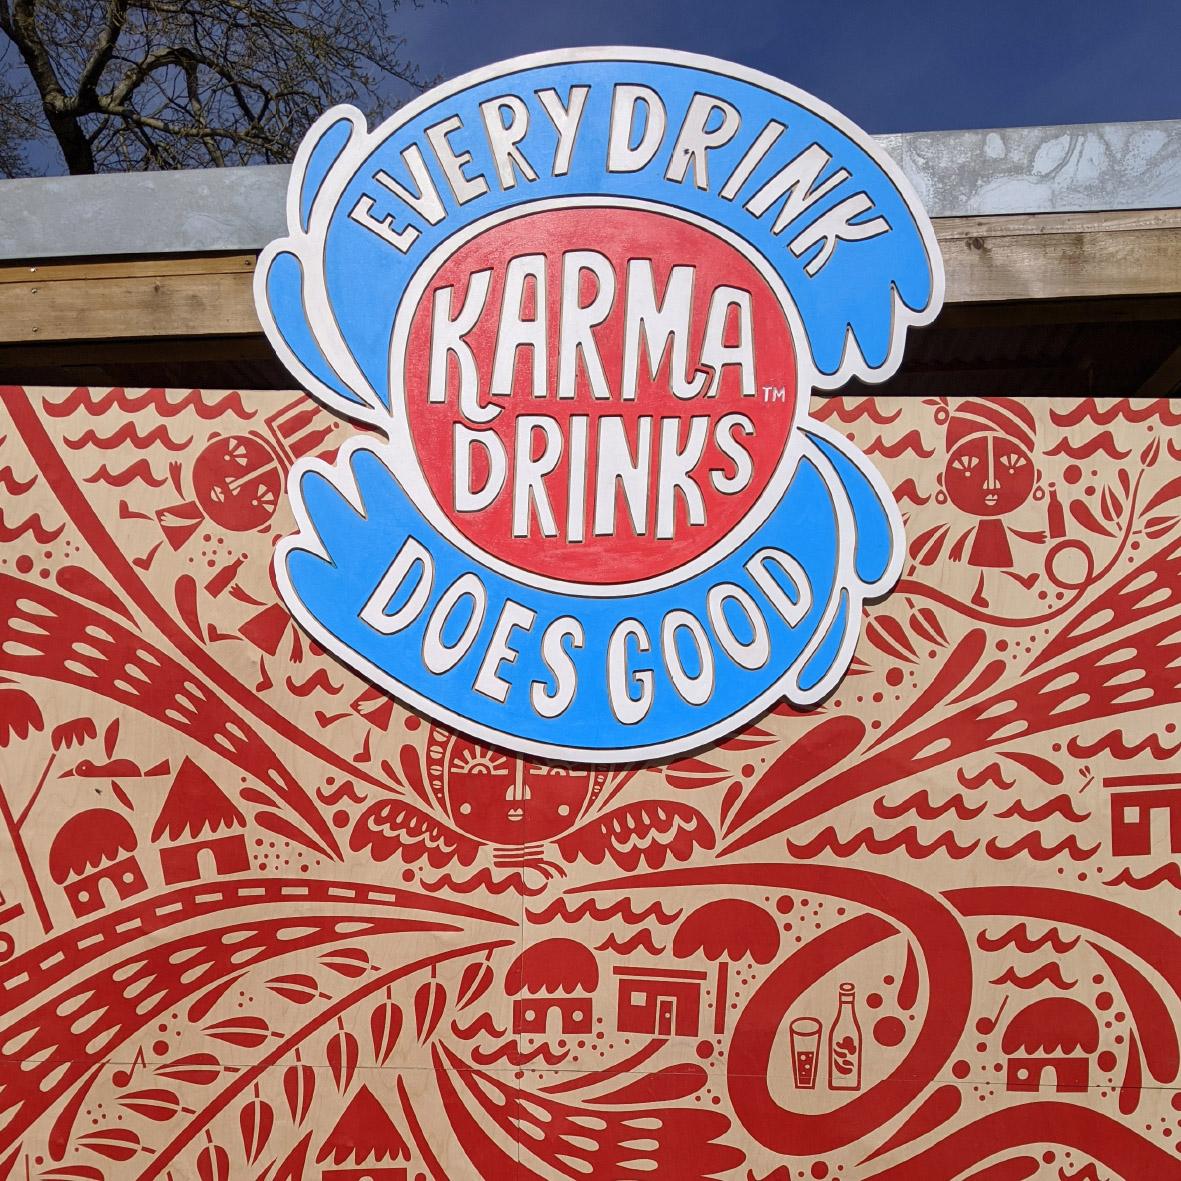 karma drinks stand cnc design